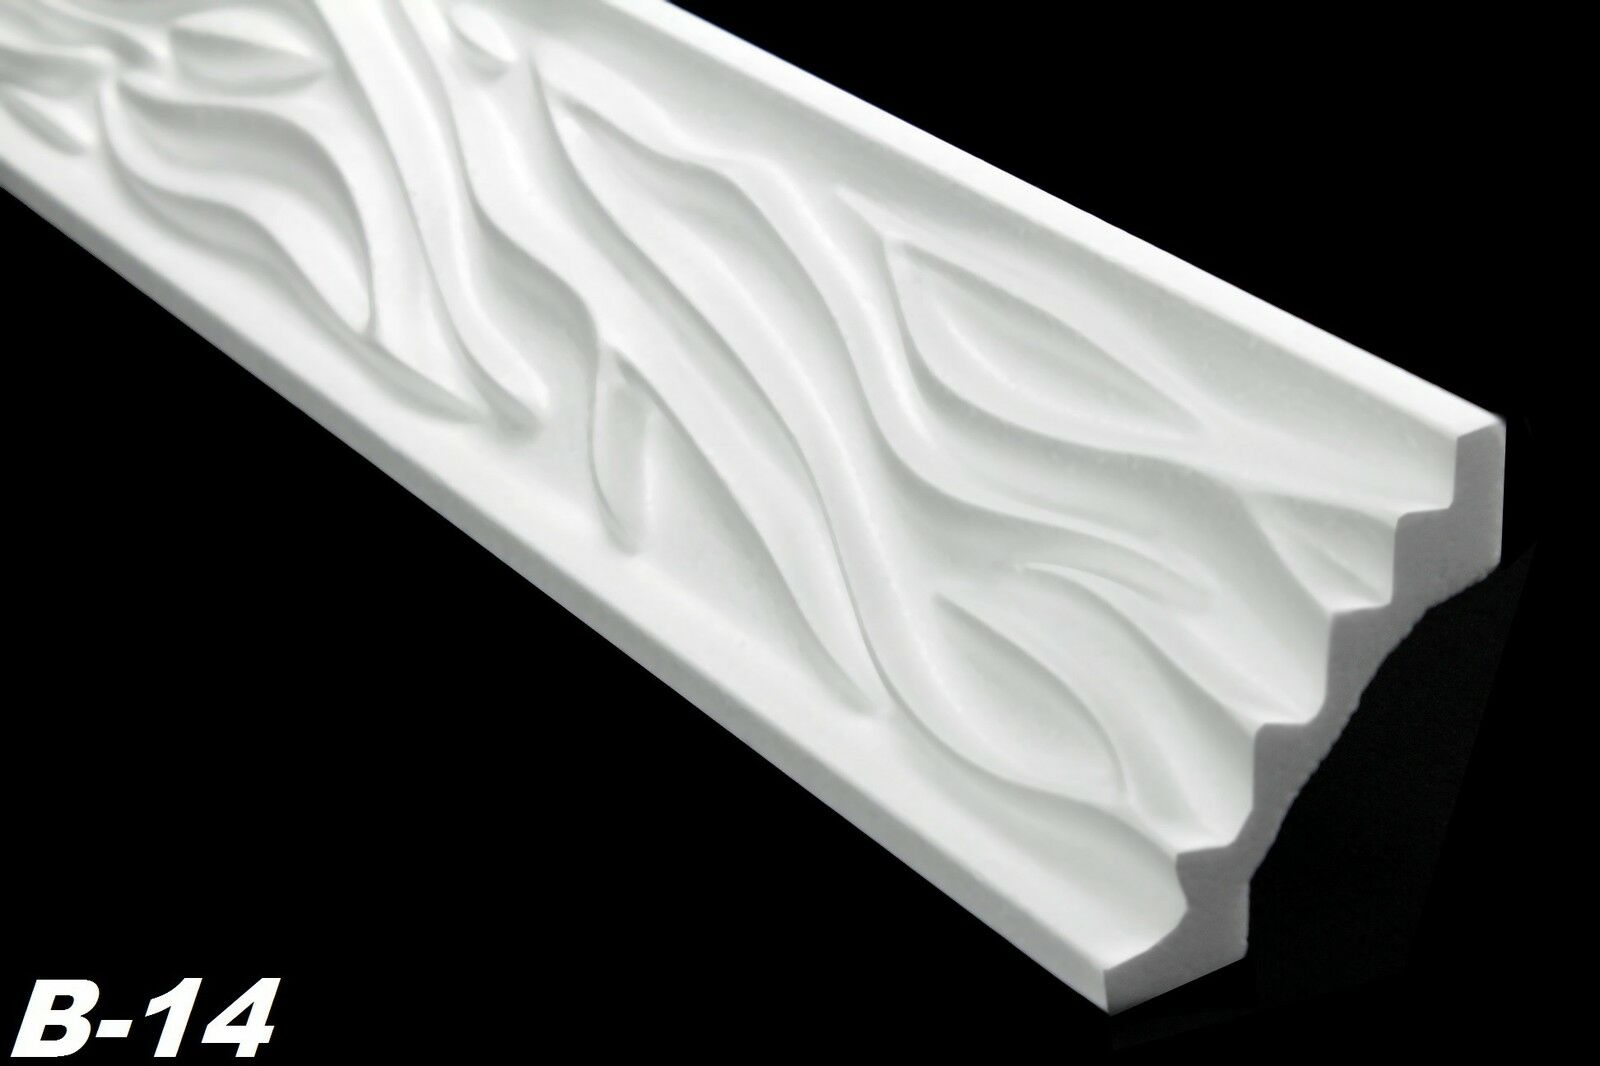 10 meter eckleisten zierprofile stuck dekoration styropor 54x54mm b 14 l hne. Black Bedroom Furniture Sets. Home Design Ideas